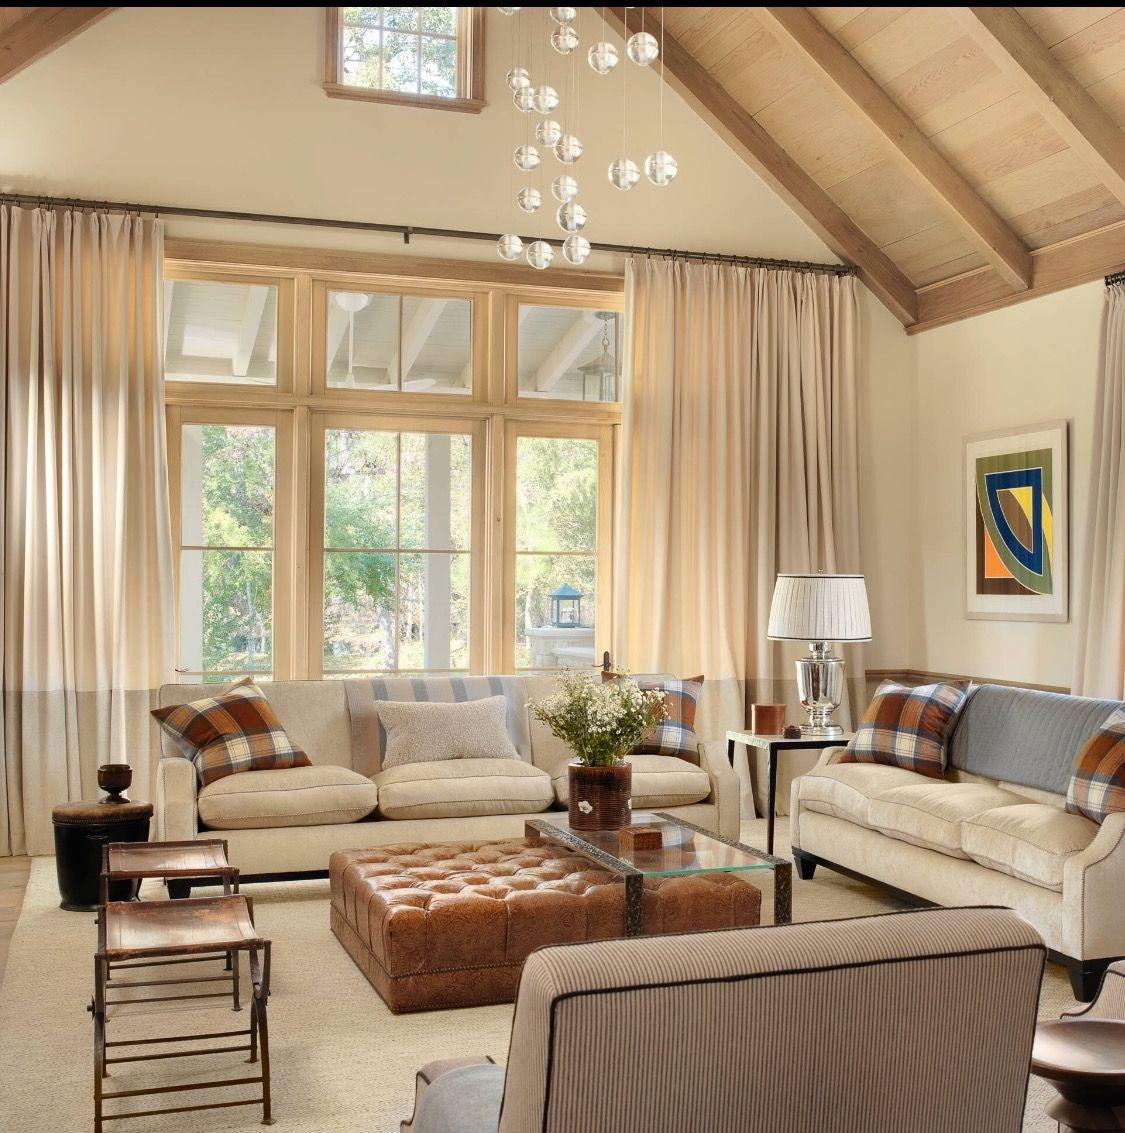 Farm house living room by رجاء ربي on Home decor | Formal ...